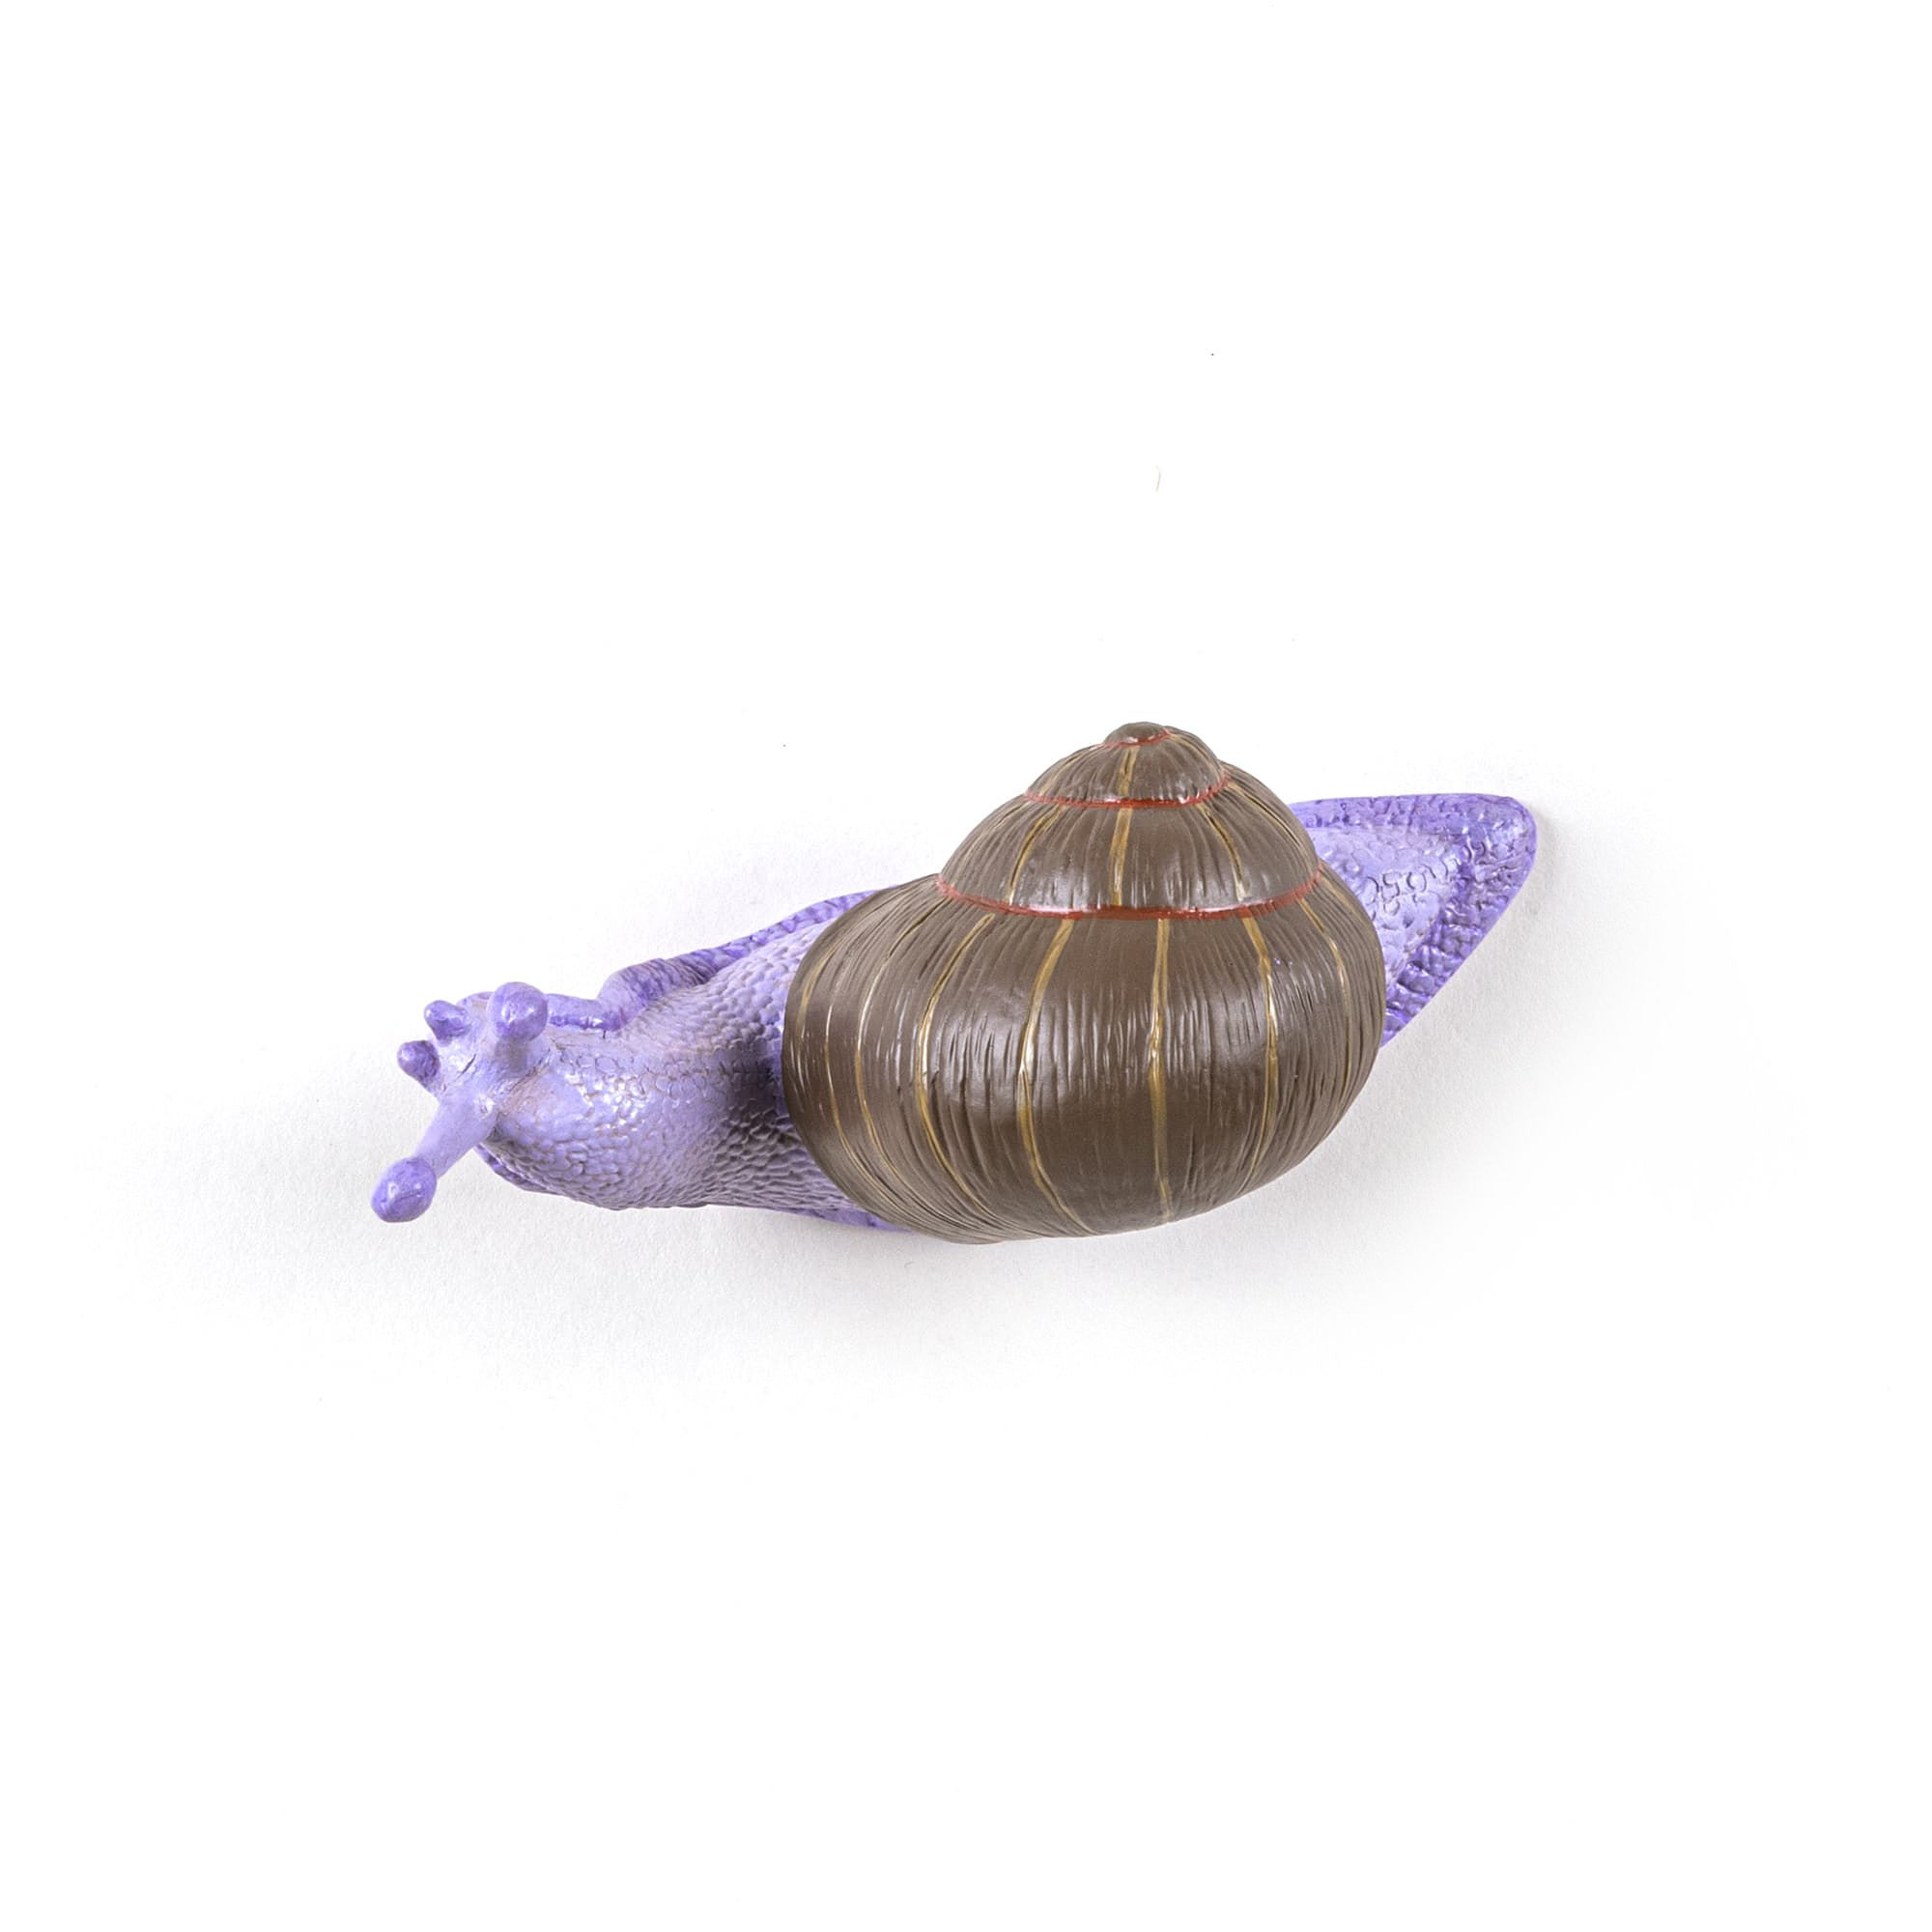 Arredamento - Appendiabiti  - Appendiabiti Snail Slow - / Escargot - Resina di Seletti - Viola & marrone - Resina